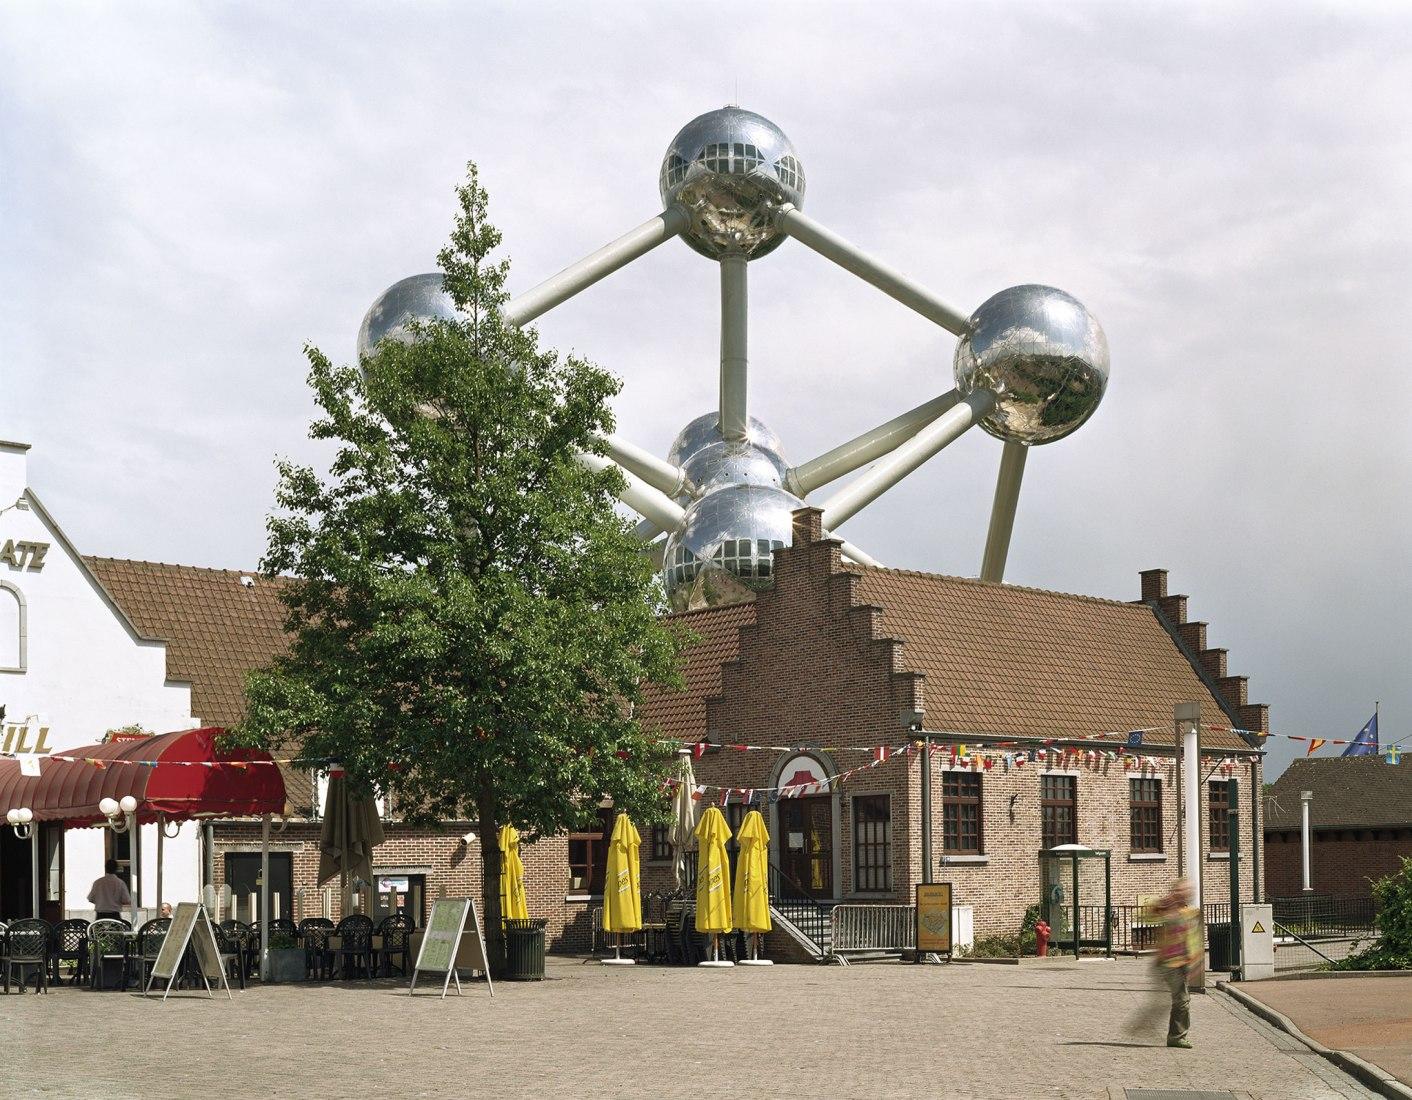 Feria Mundial de Bruselas de 1958,